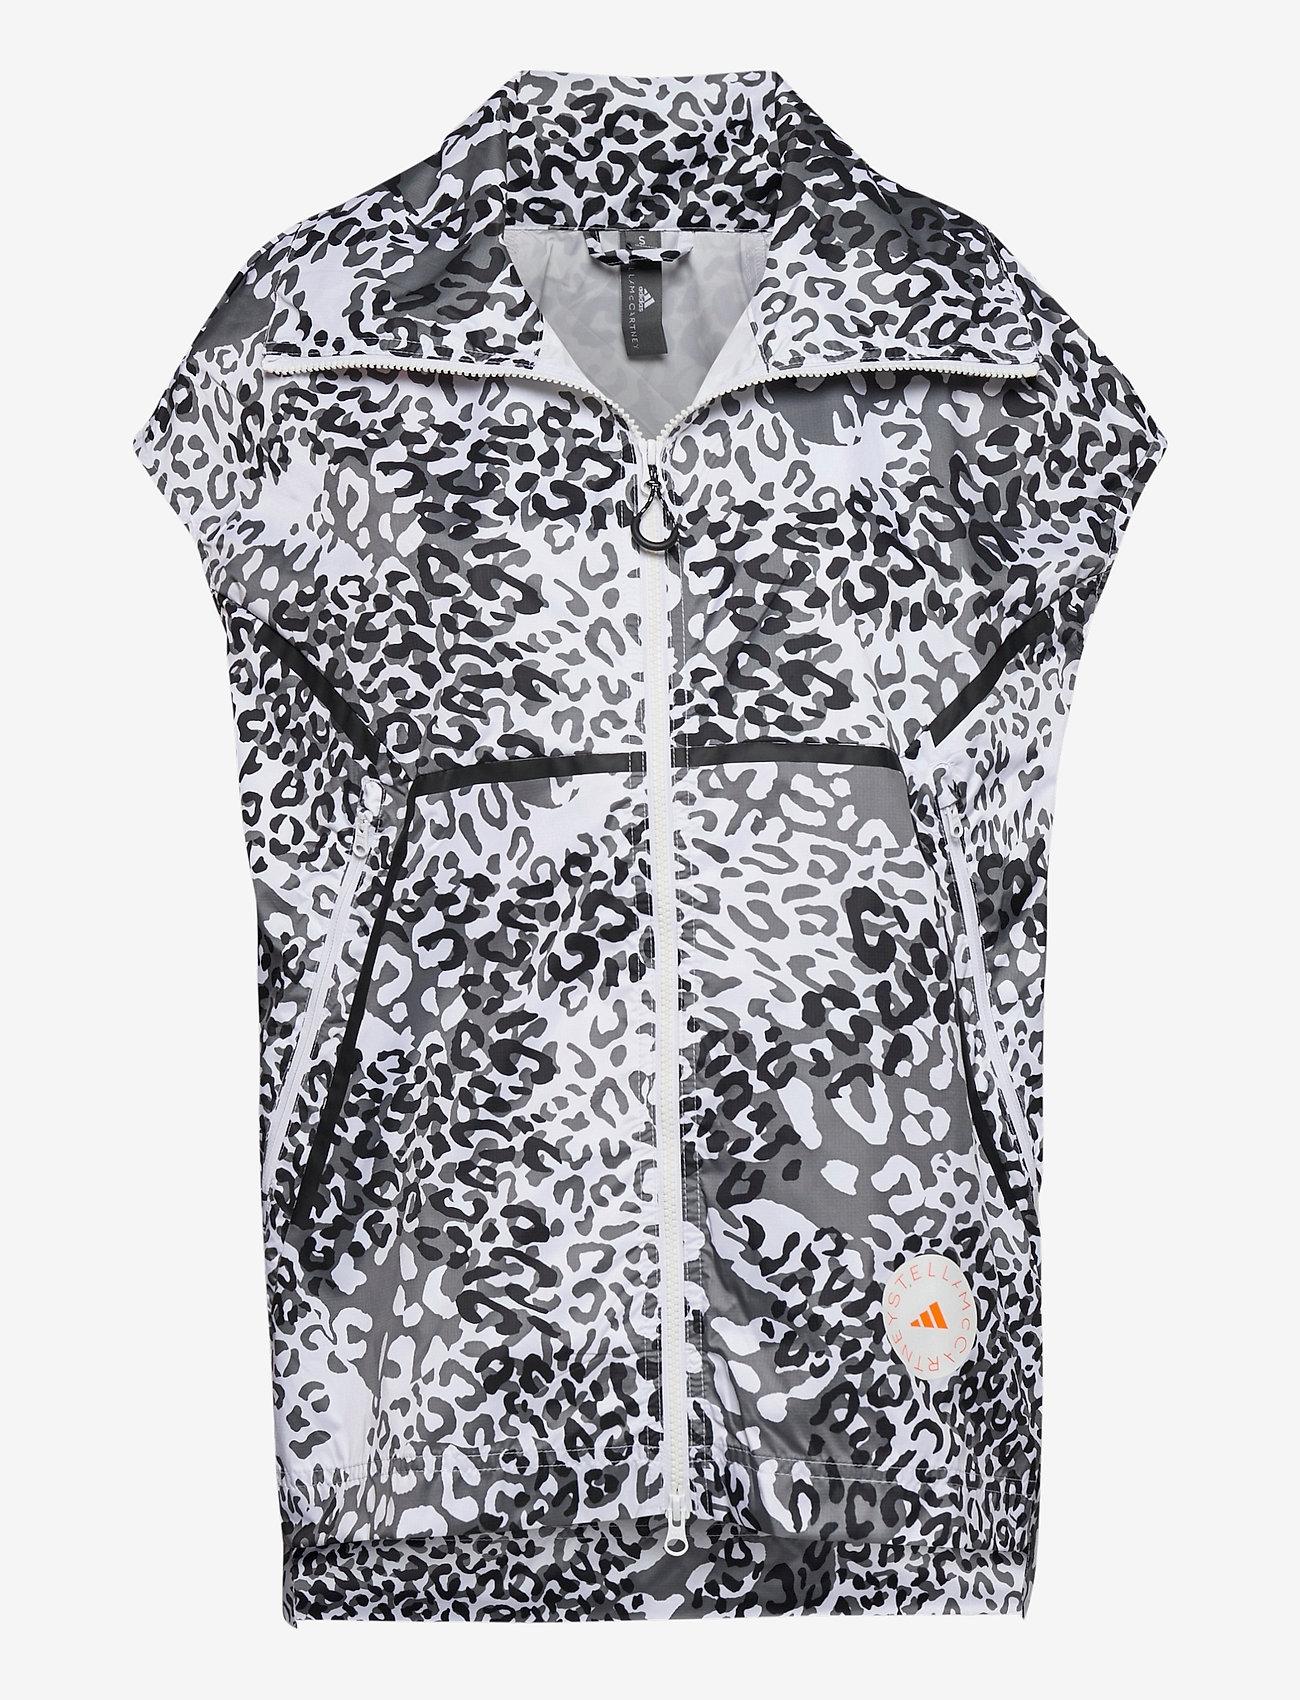 adidas by Stella McCartney - TRUEPACE GILET - toppaliivit - white/black/ash - 1